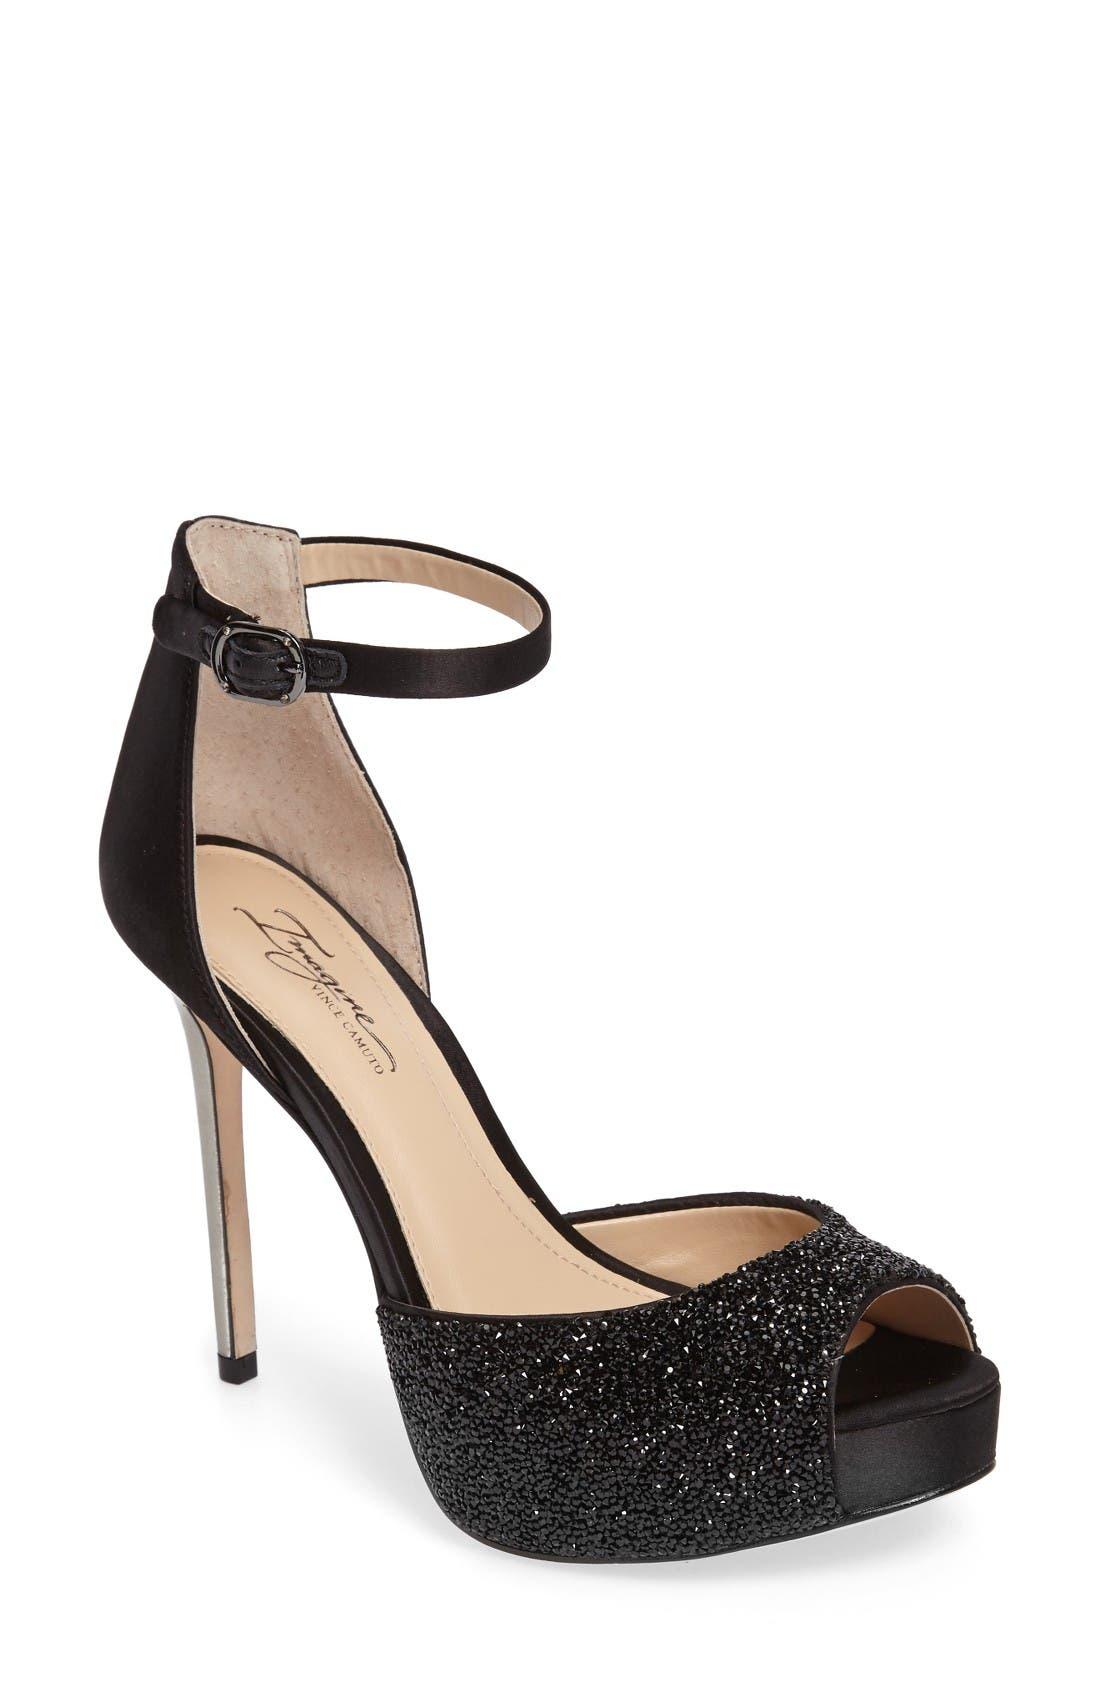 Imagine by Vince Camuto Karleigh Platform Sandal (Women)